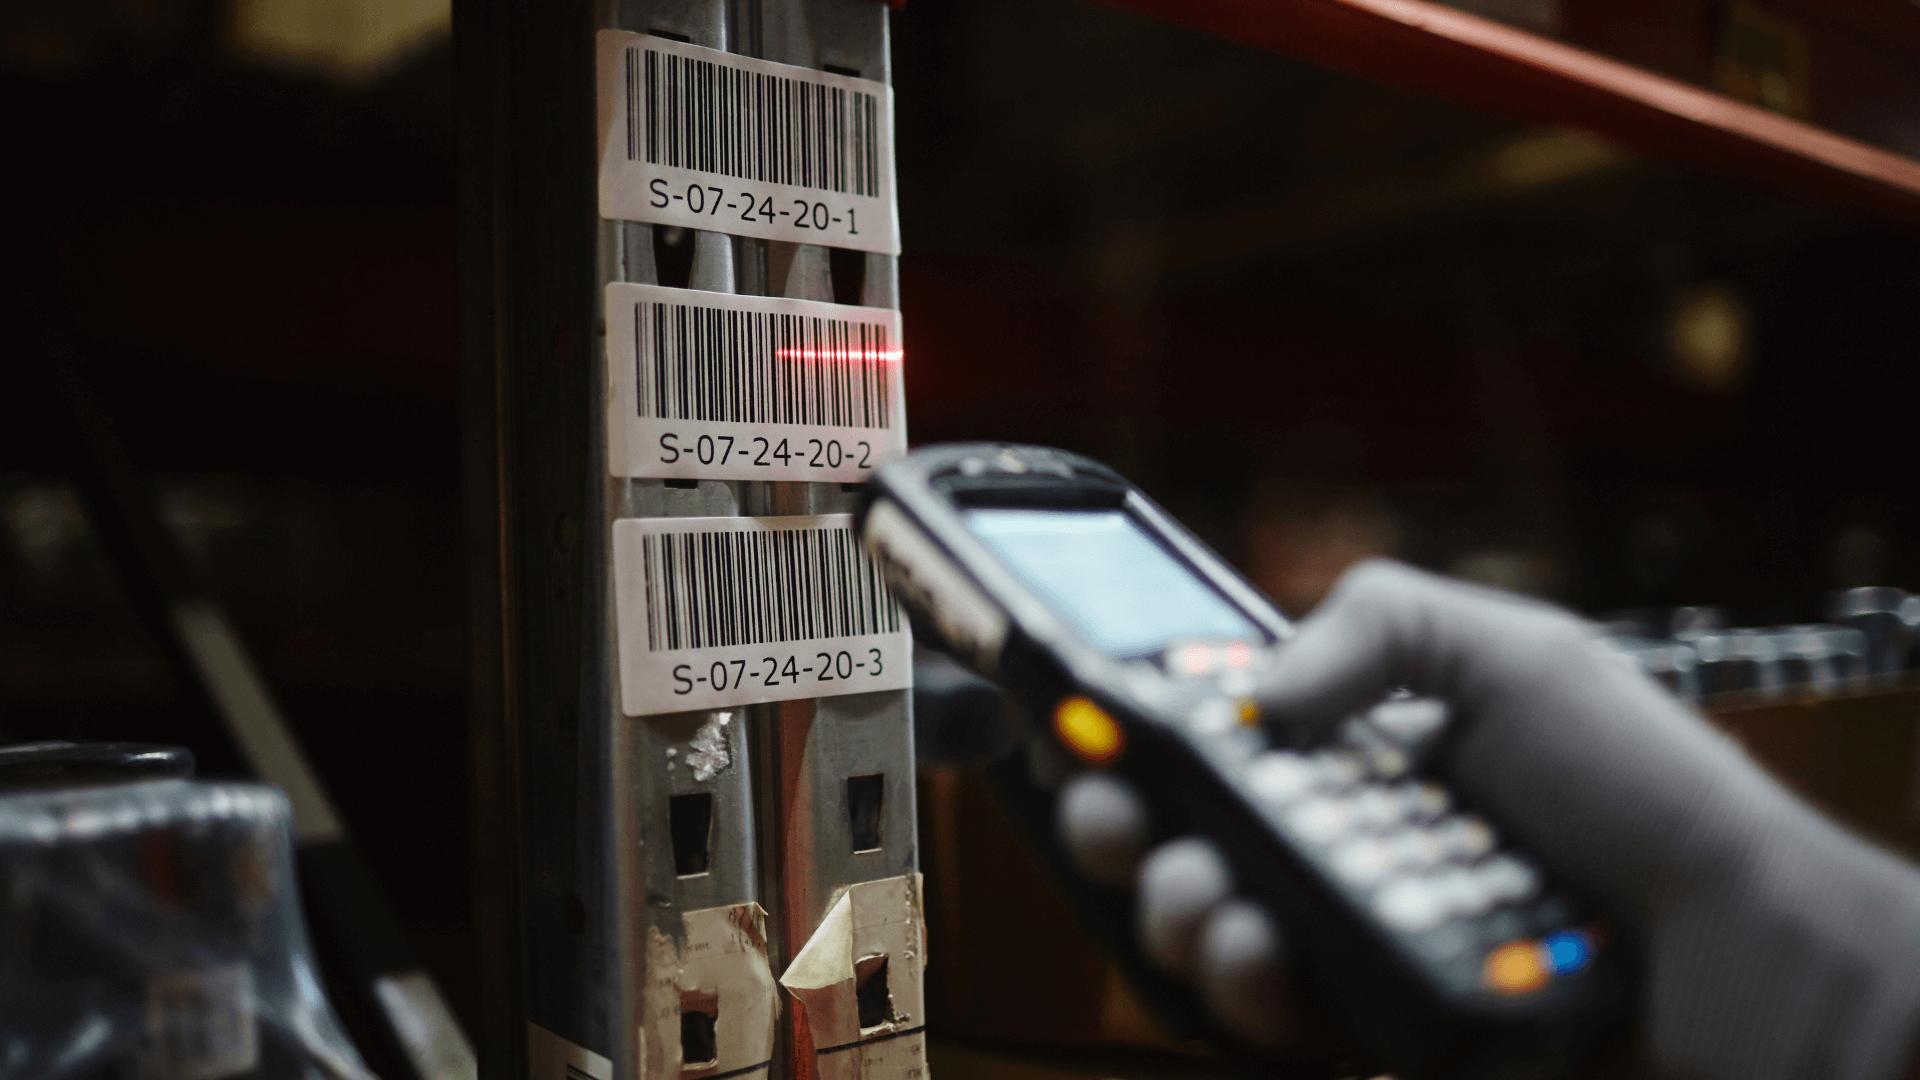 Barcode Scanning in Stream